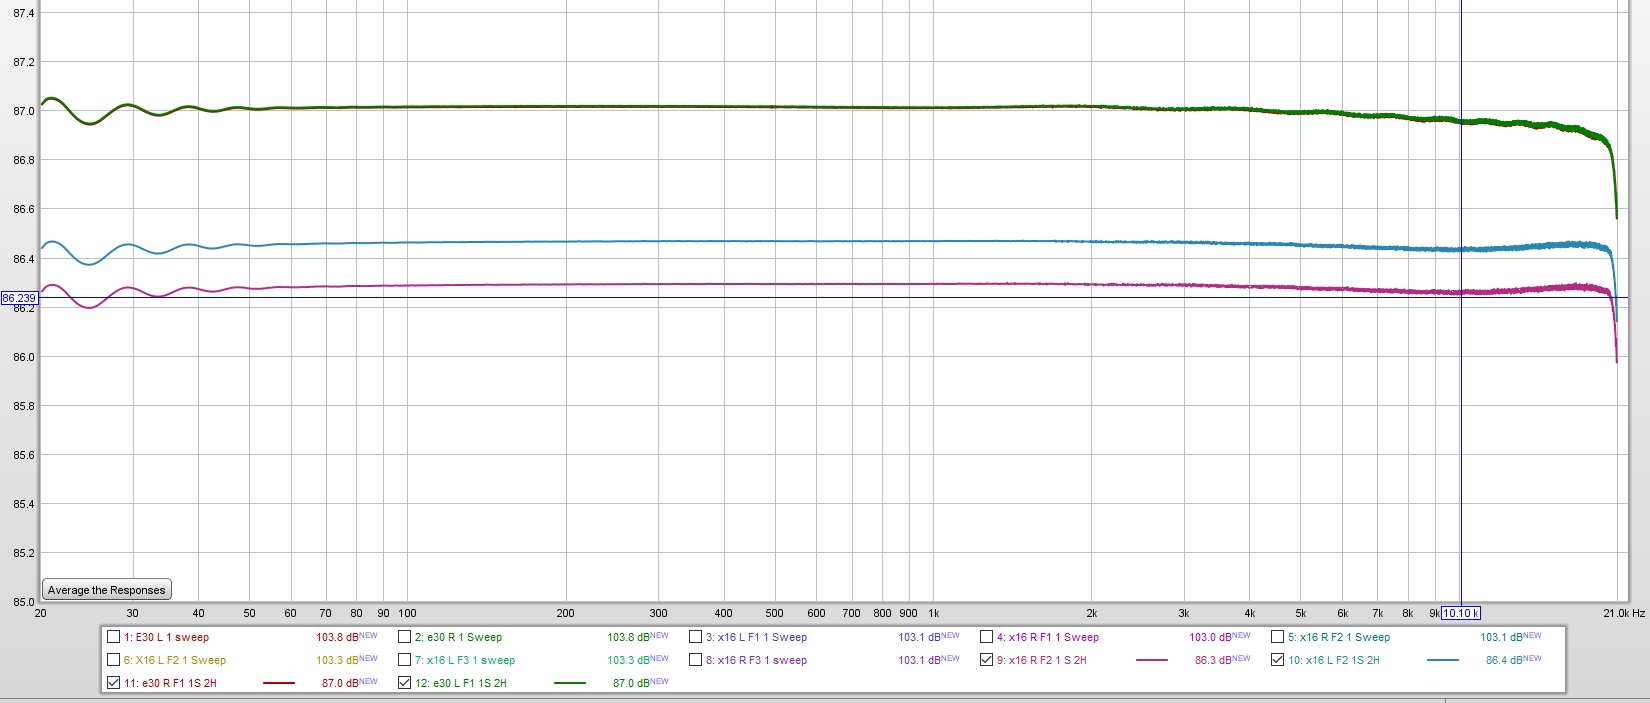 e30_vs_x16_filter_2_2HR.PNG